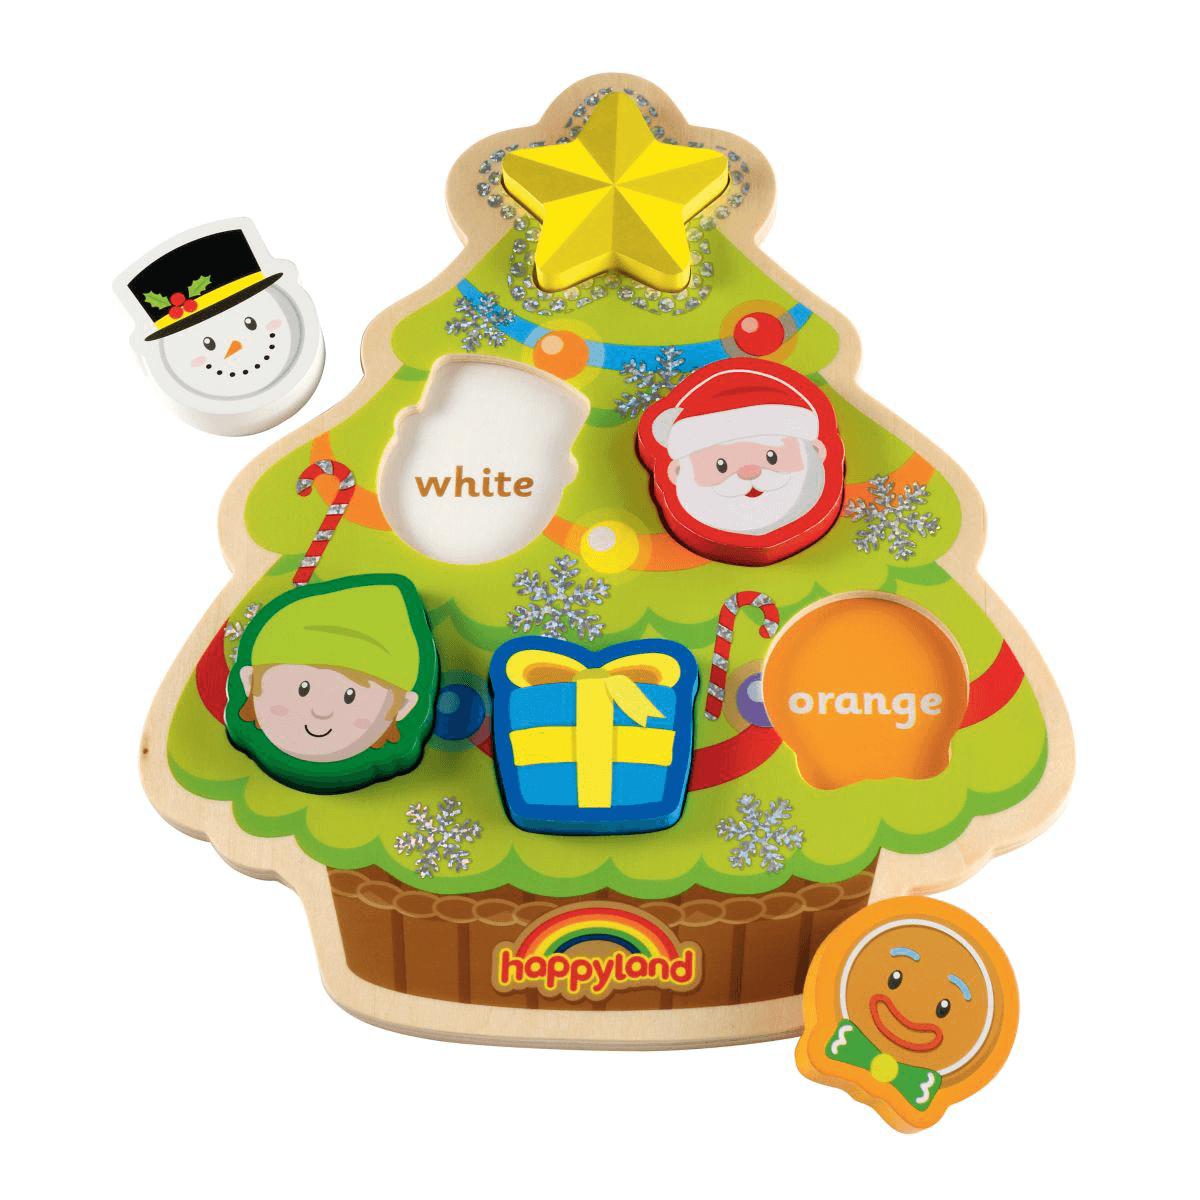 Happyland Wooden Christmas Puzzle